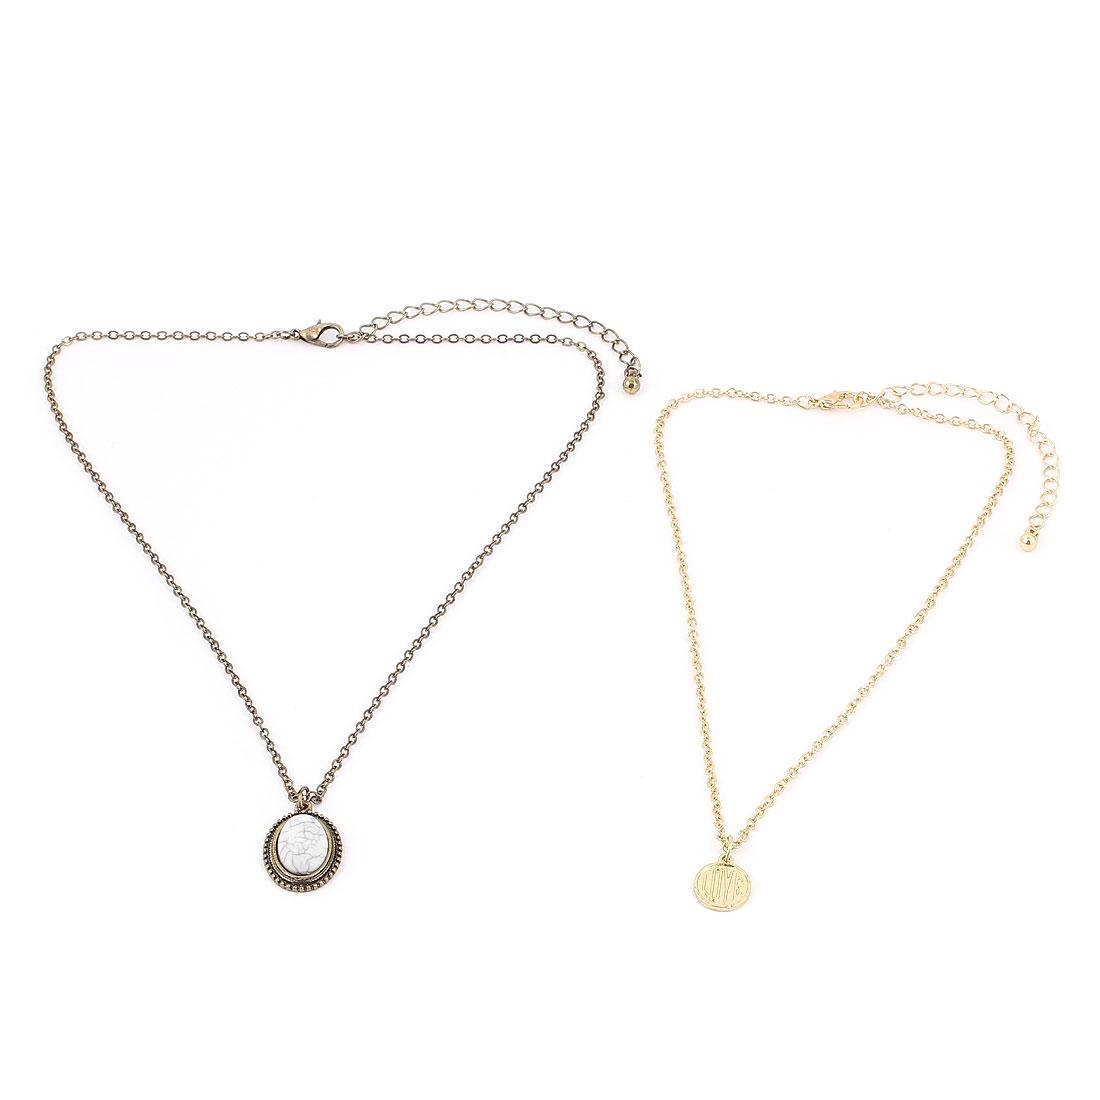 2 Pcs Tricolor Metal Plastic Pendant Lobster Buckle Strip Link Slim Chain Necklaces Neckwear Collar for Ladies Women